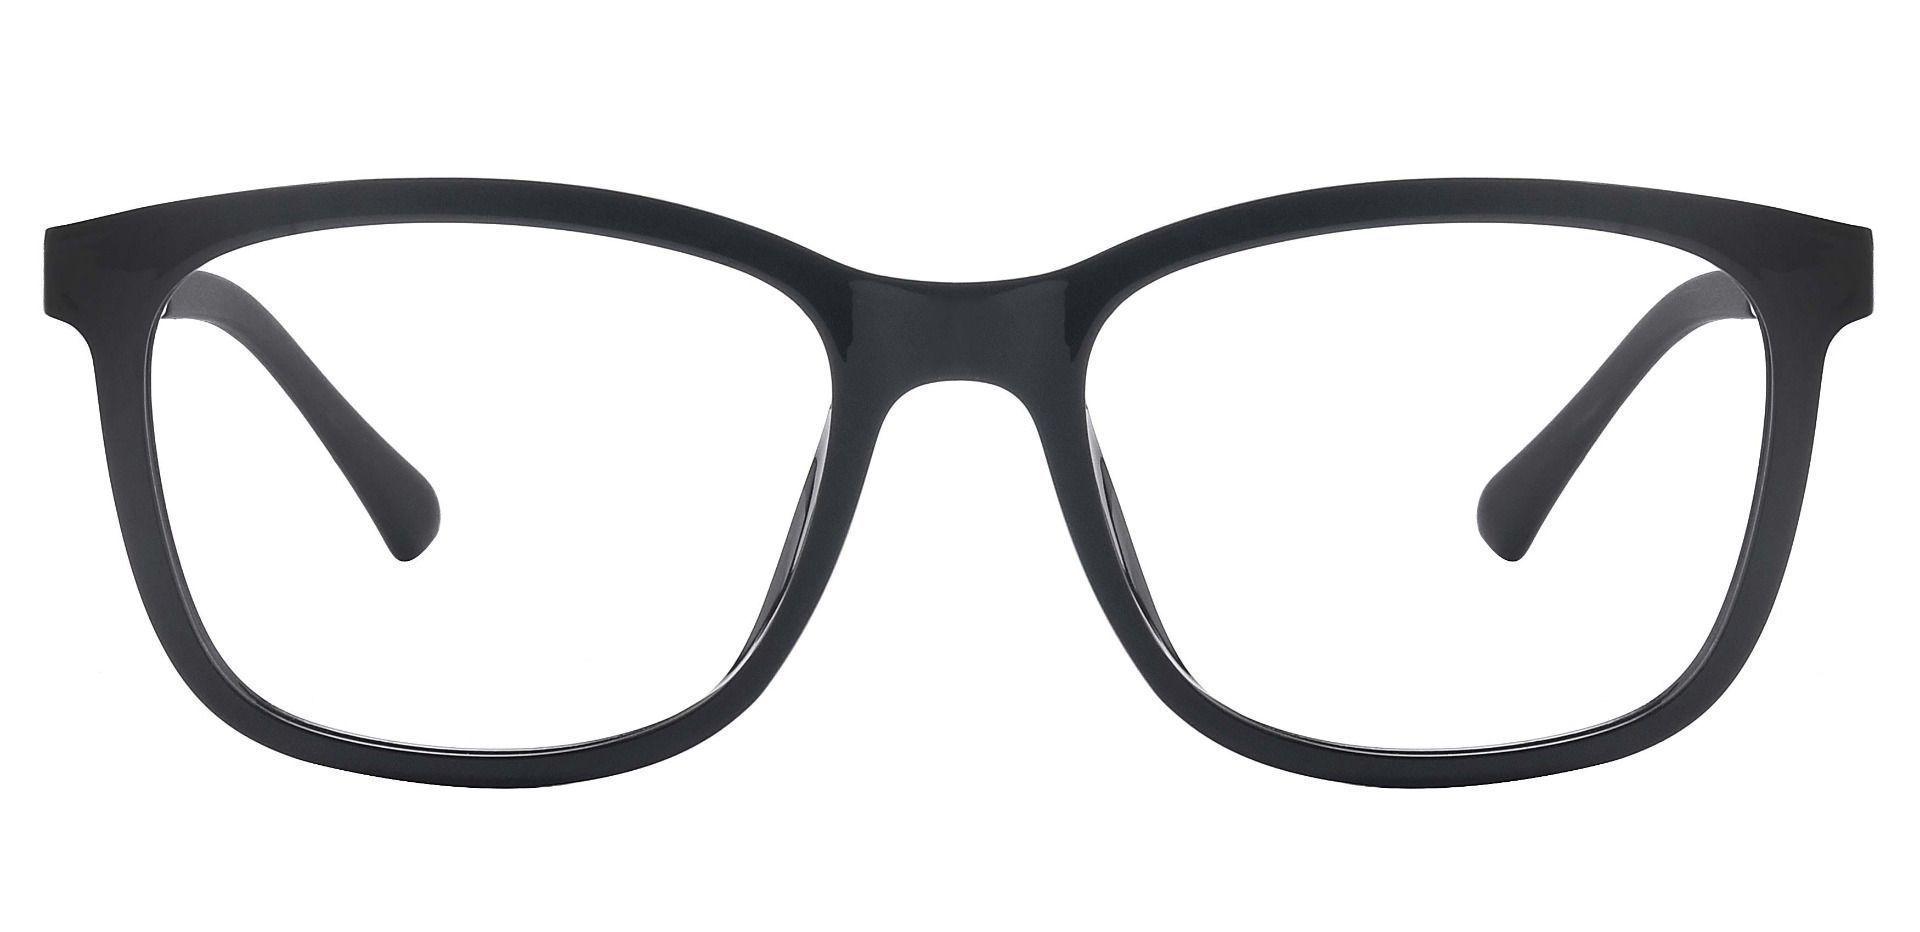 Cairo Classic Square Prescription Glasses - The Frame Is Black And White